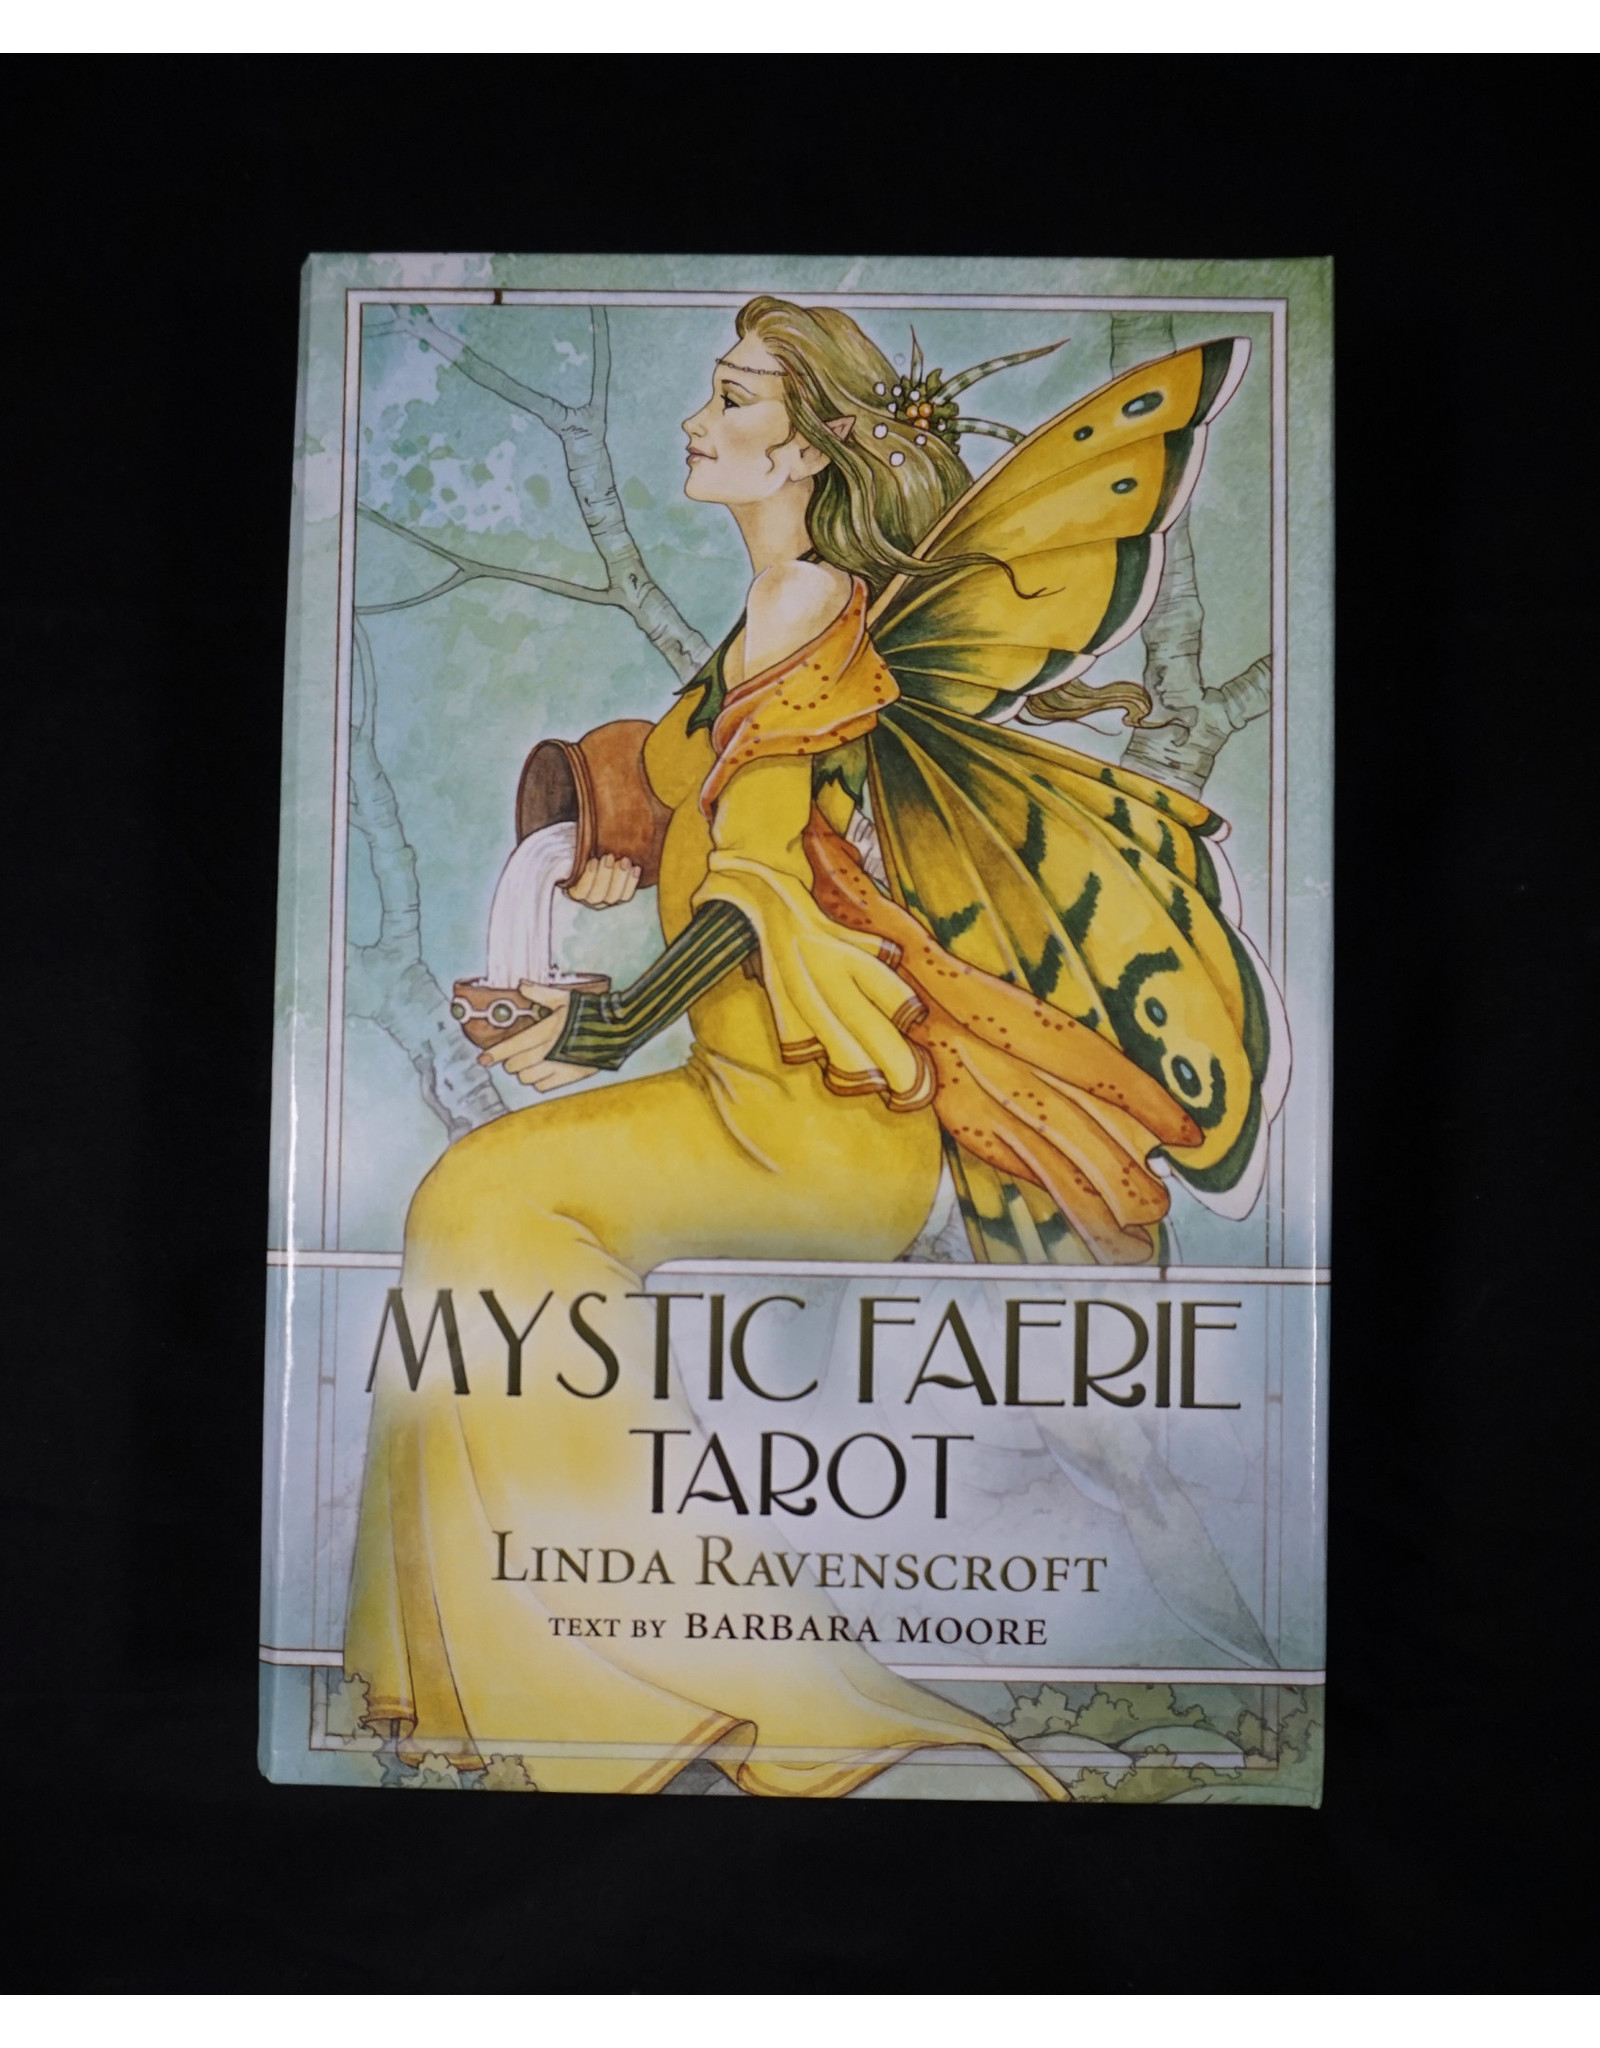 Mystic Faerie Tarot by Barbara Moore